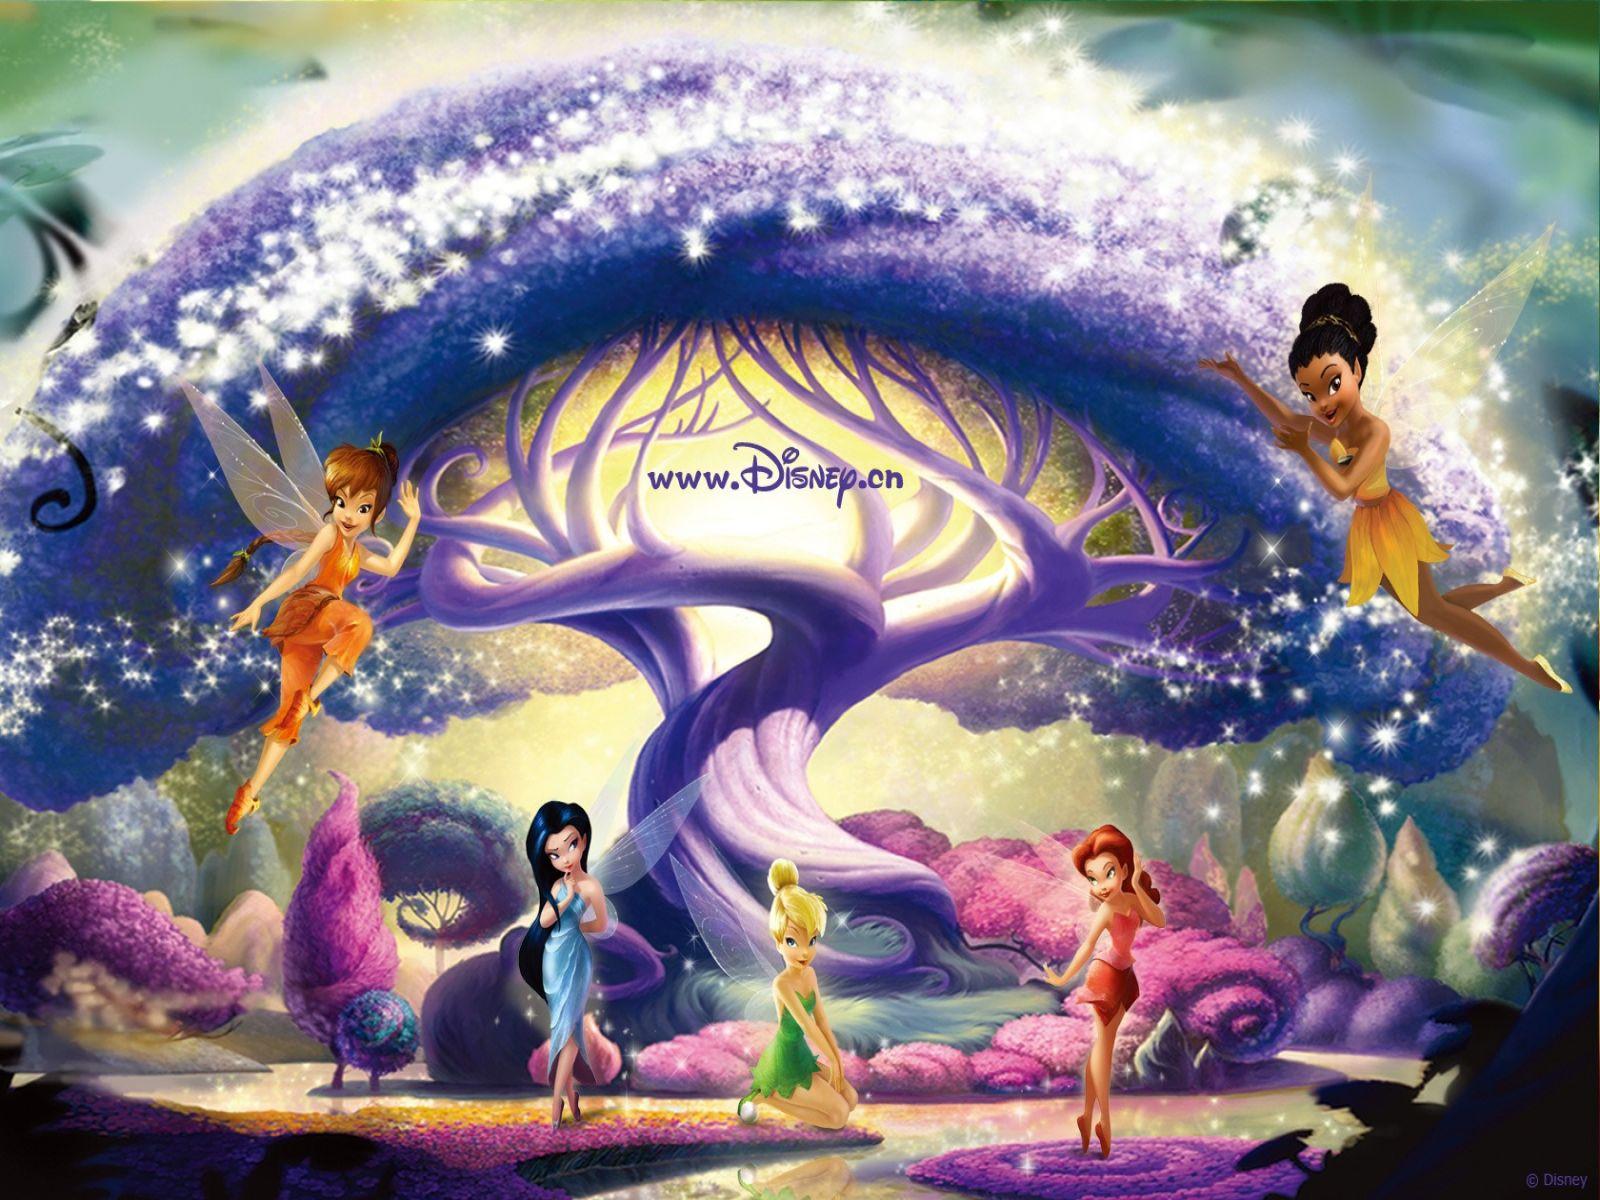 In summer hd wallpaper download cartoon wallpaper html code - Disney Cartoon Desktop Wallpaper Download Hd Wallpapers